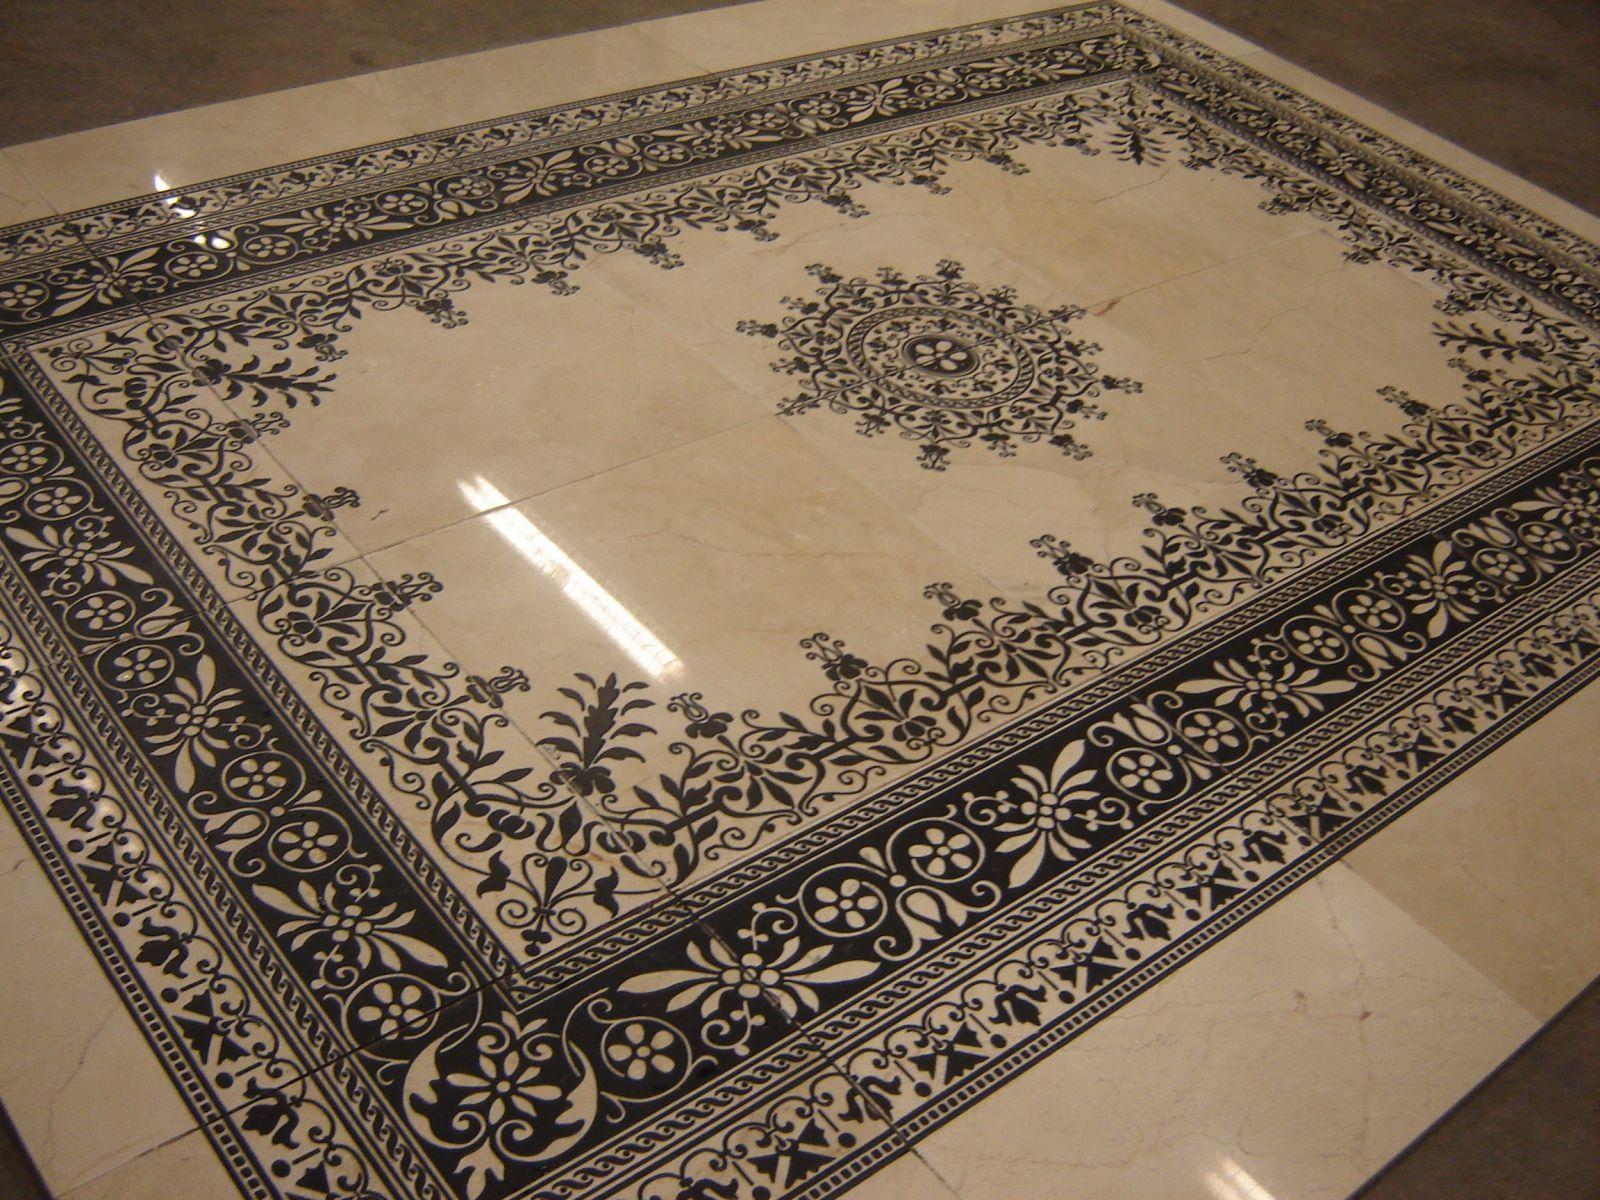 Marble Designs laser-islamic-design-on-white-marble-   // • ιsℓαмιc αяcнιтεcтυяε